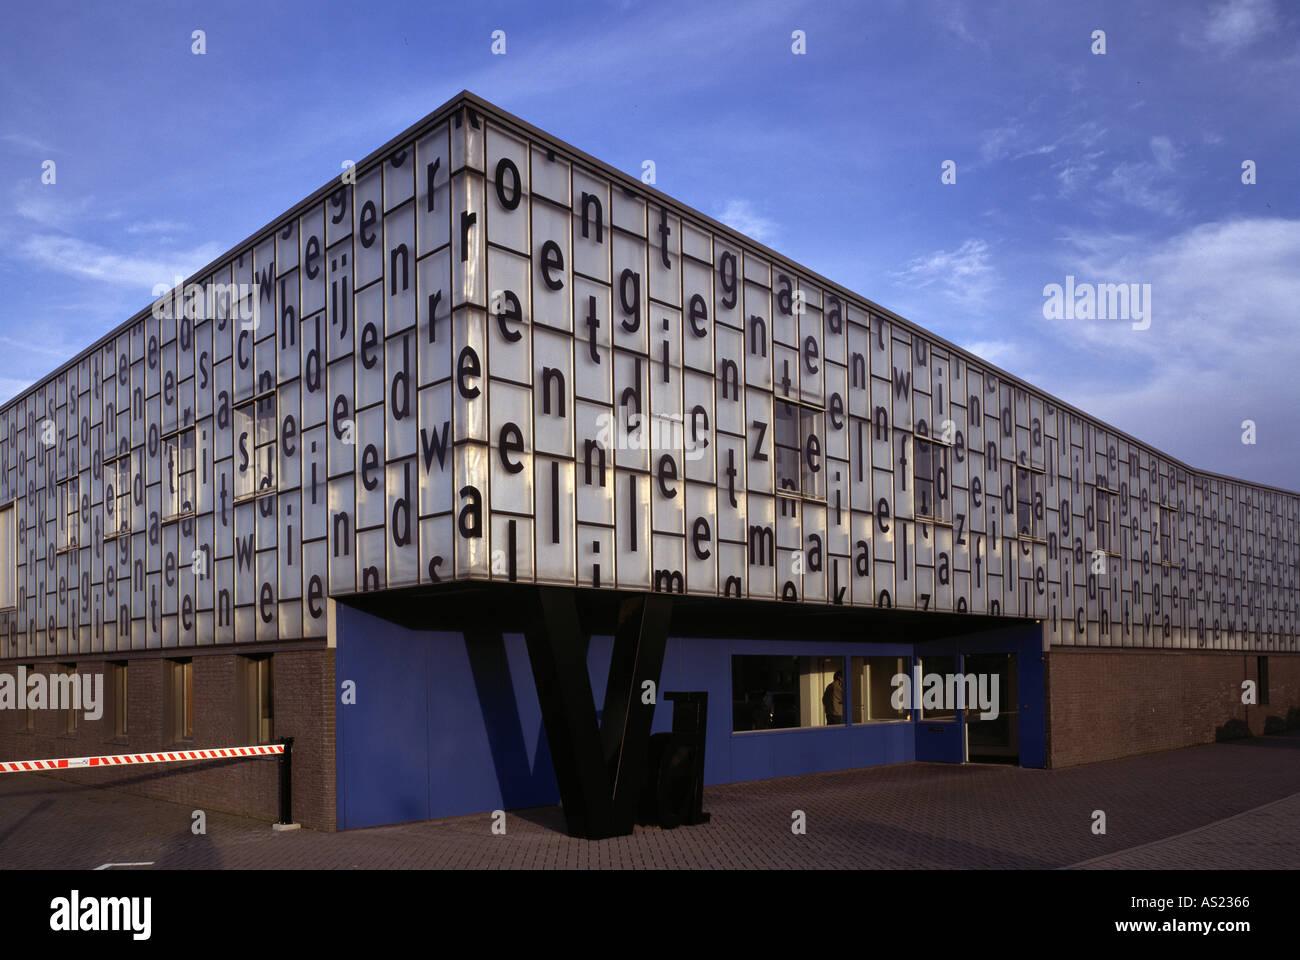 Ede, Druckerei in der Maxwellstraat, Architekt: Willem Jan Neutelings Stock Photo